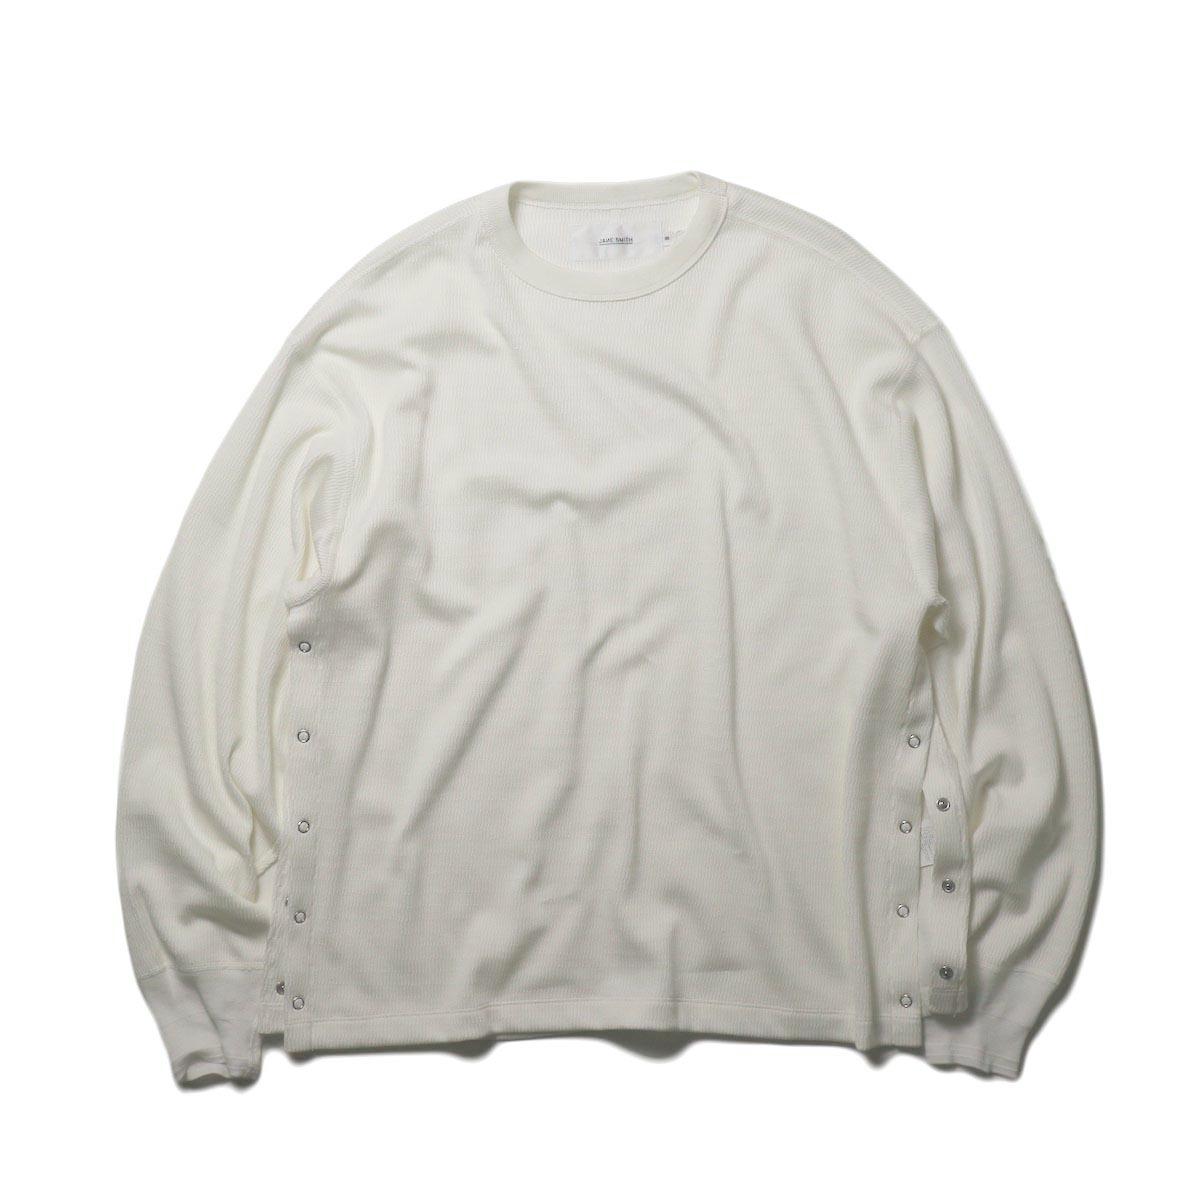 JANE SMITH / SIDE SNAP CREW NECK (white)